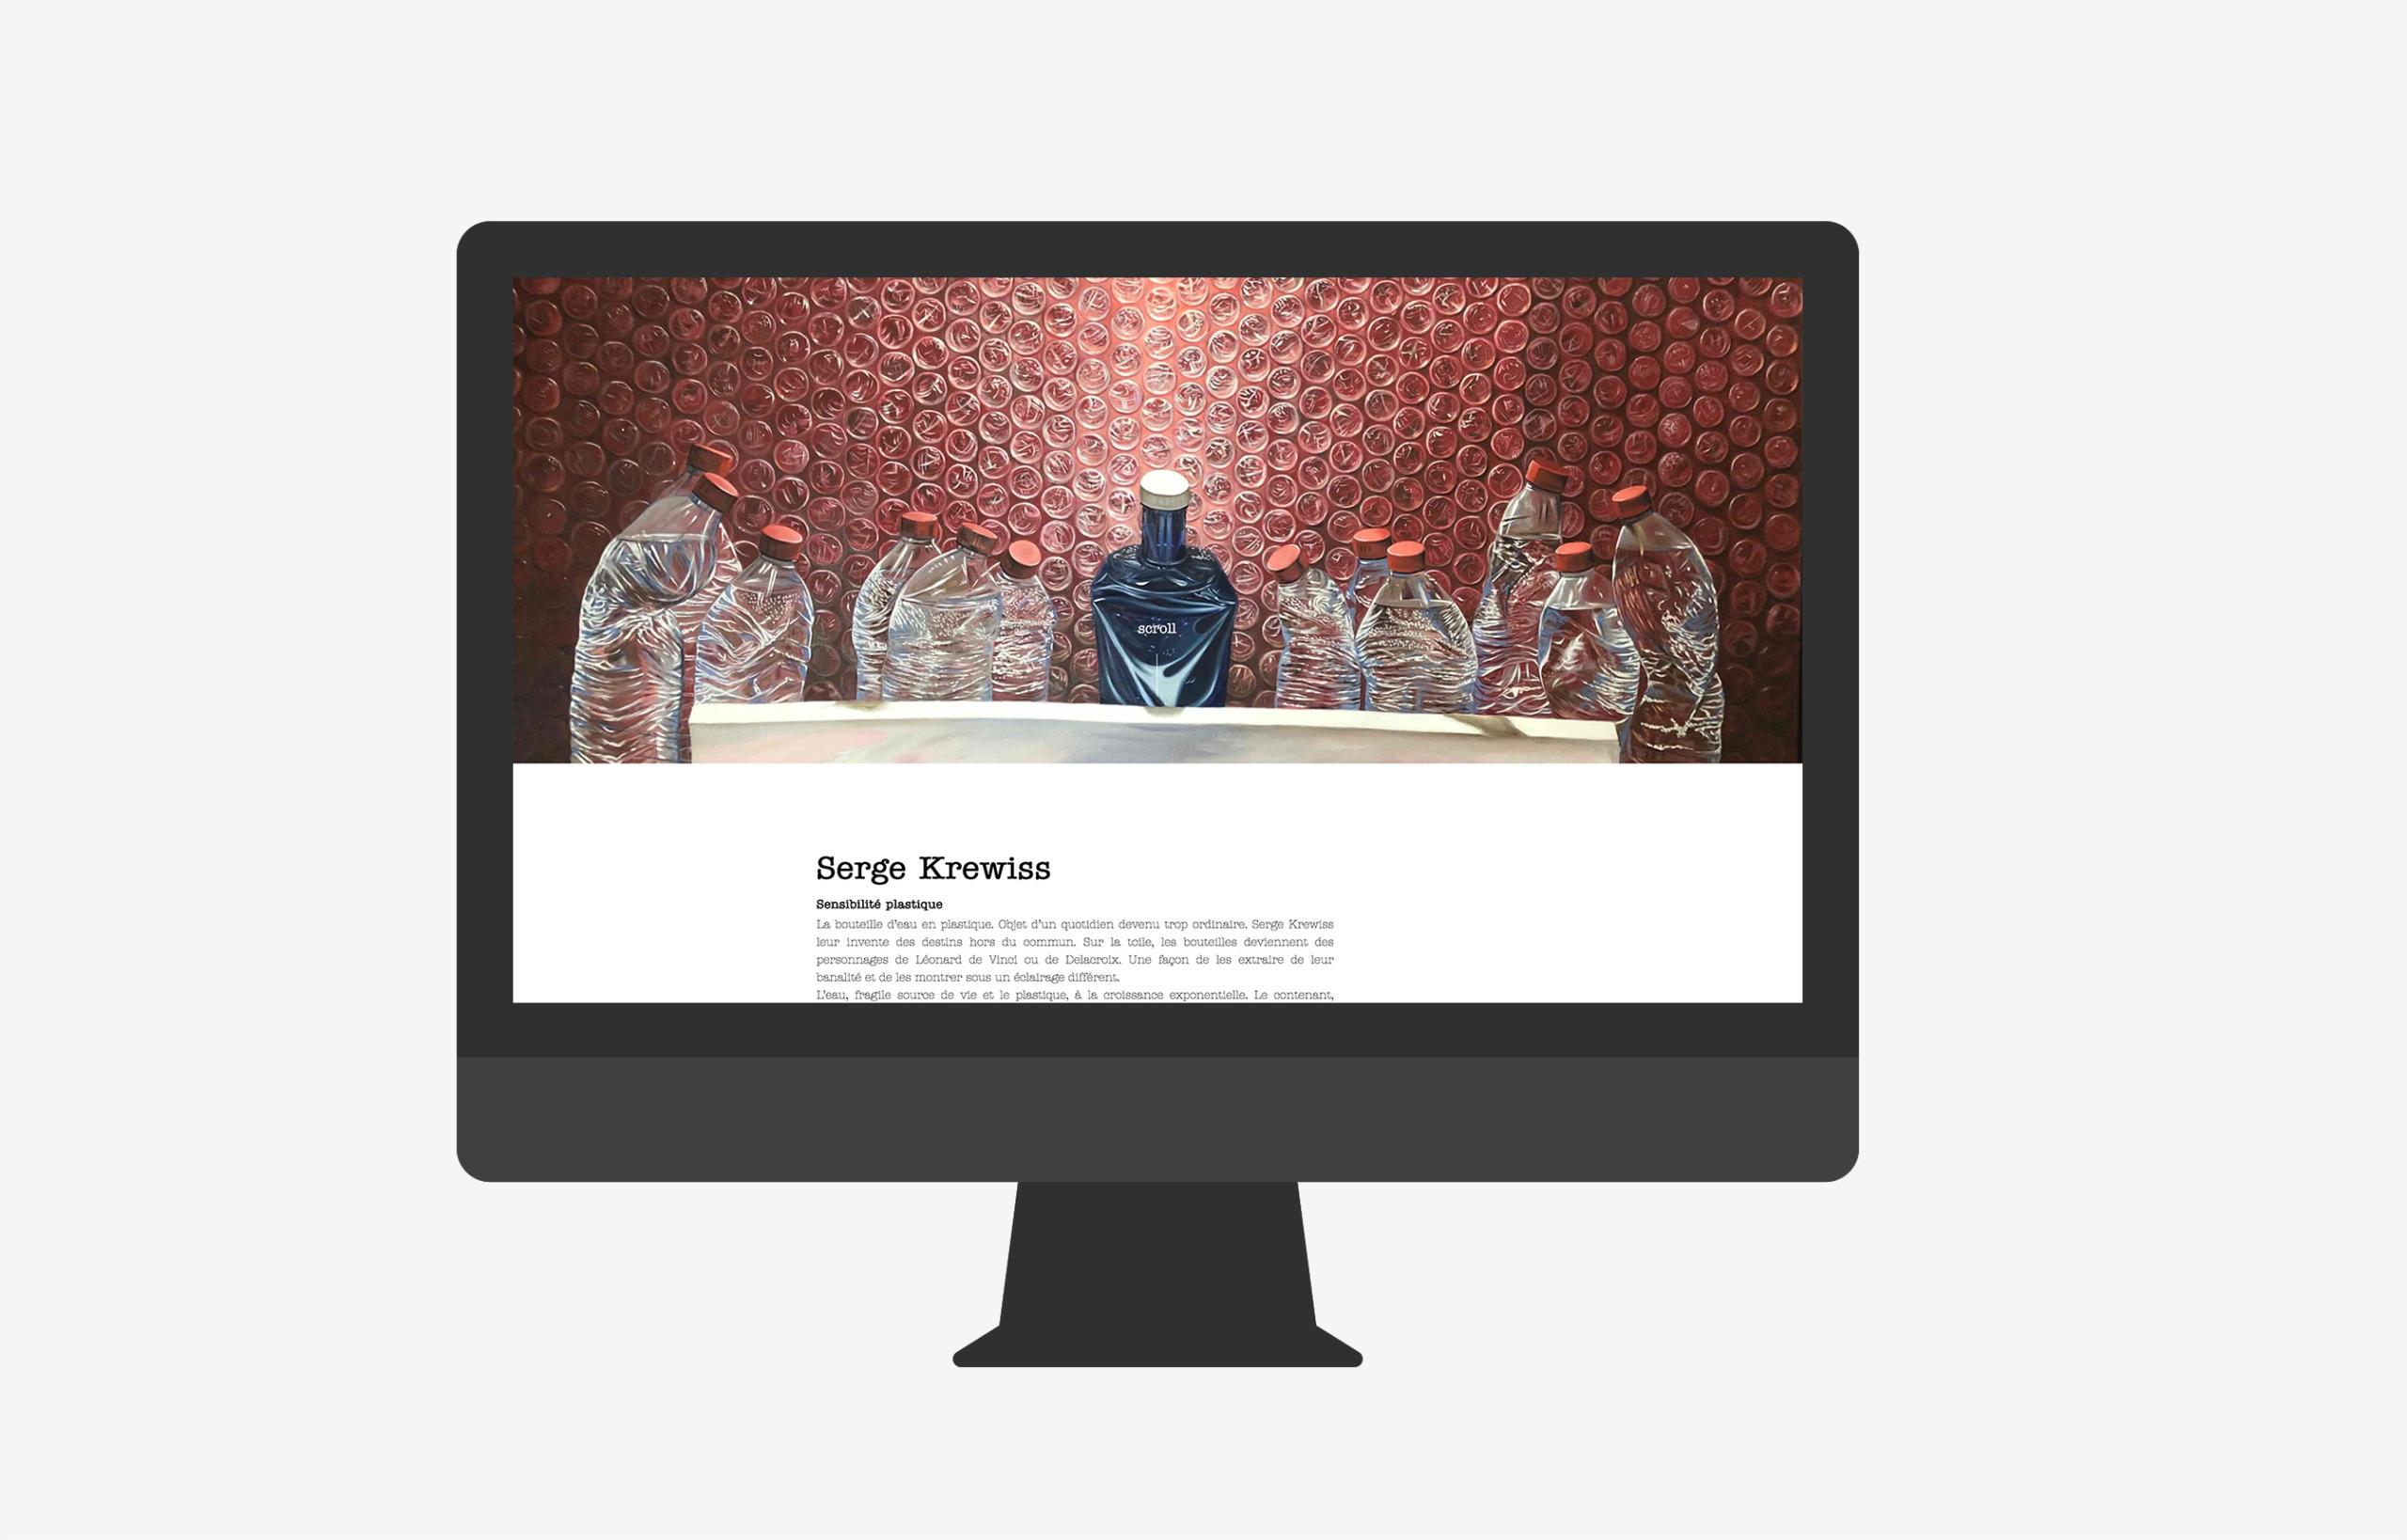 04-bettina-pikteo-webdesign-graphic-design-freelance-paris-bruxelles-londres